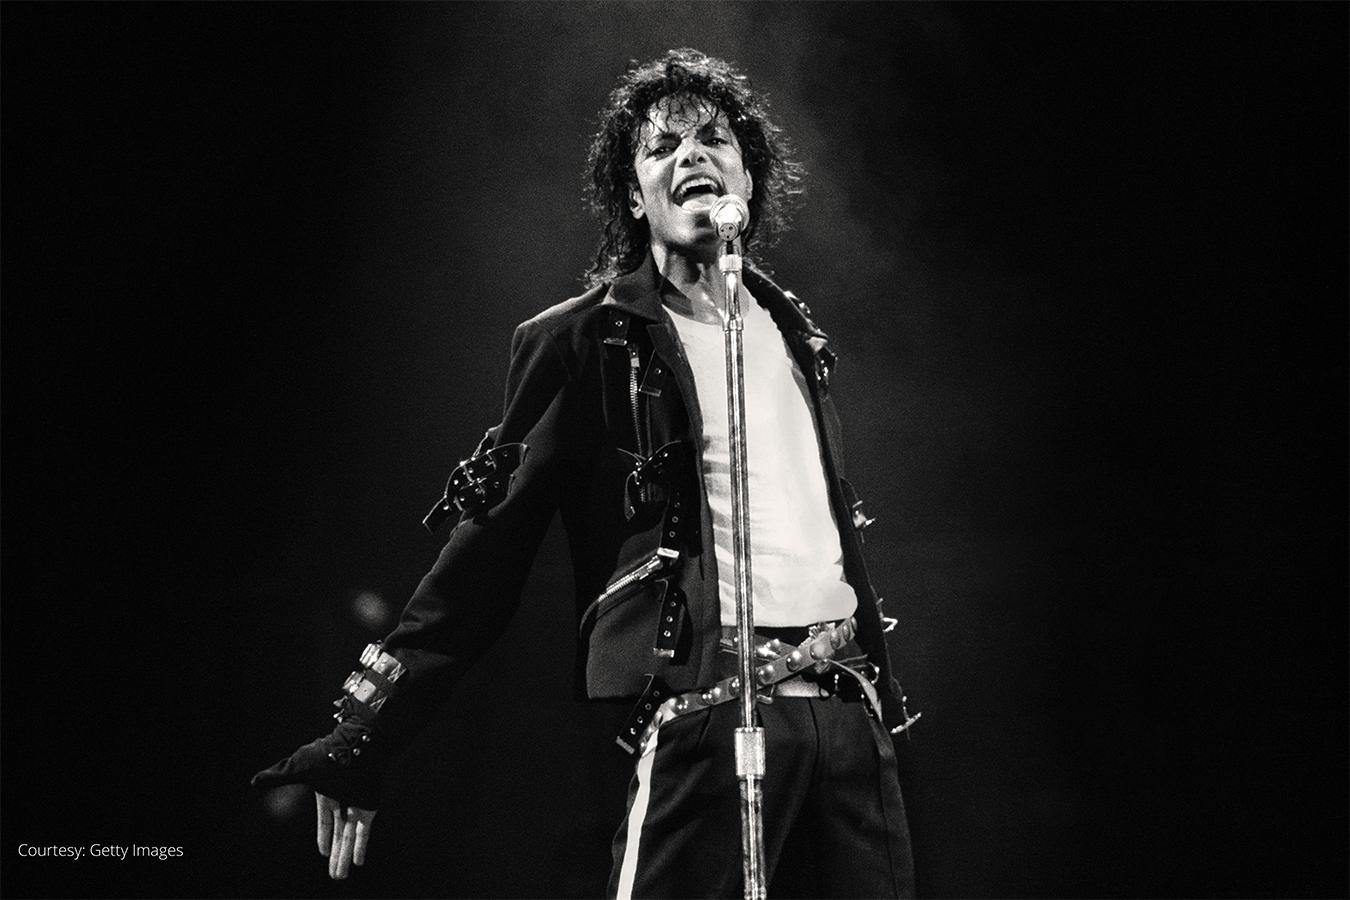 Michael Jackson Always Embraced His Blackness